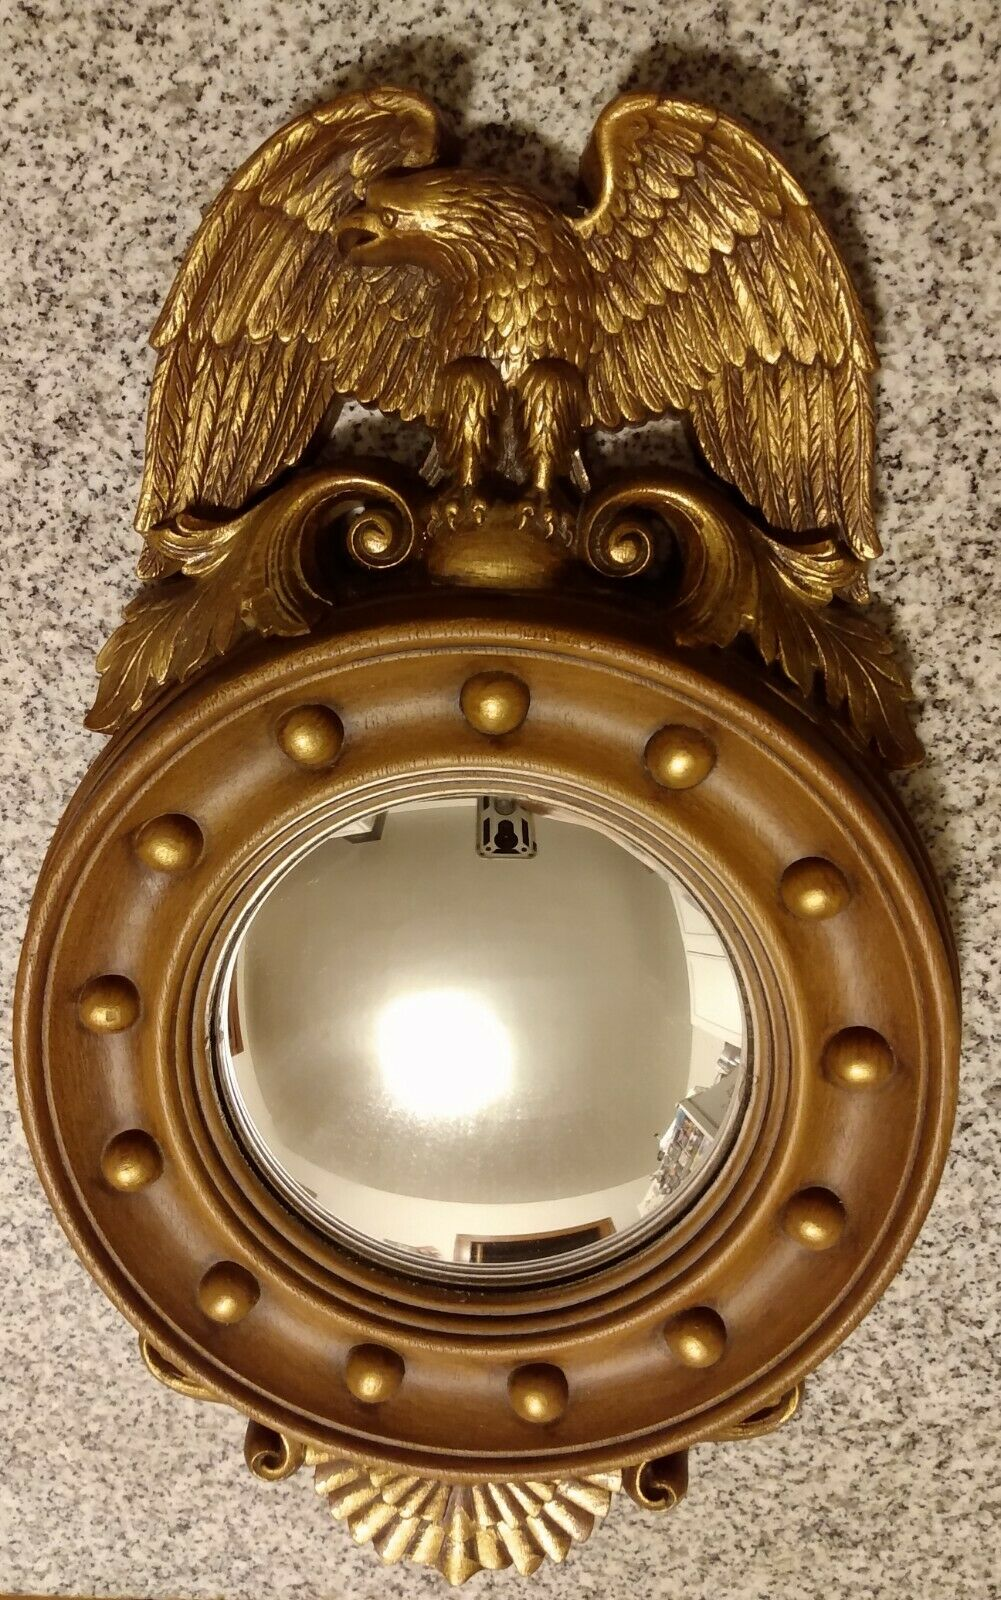 Vintage 1973 Burwood Products Federal Eagle Round Convex Mirror 13 Colonies - $124.99